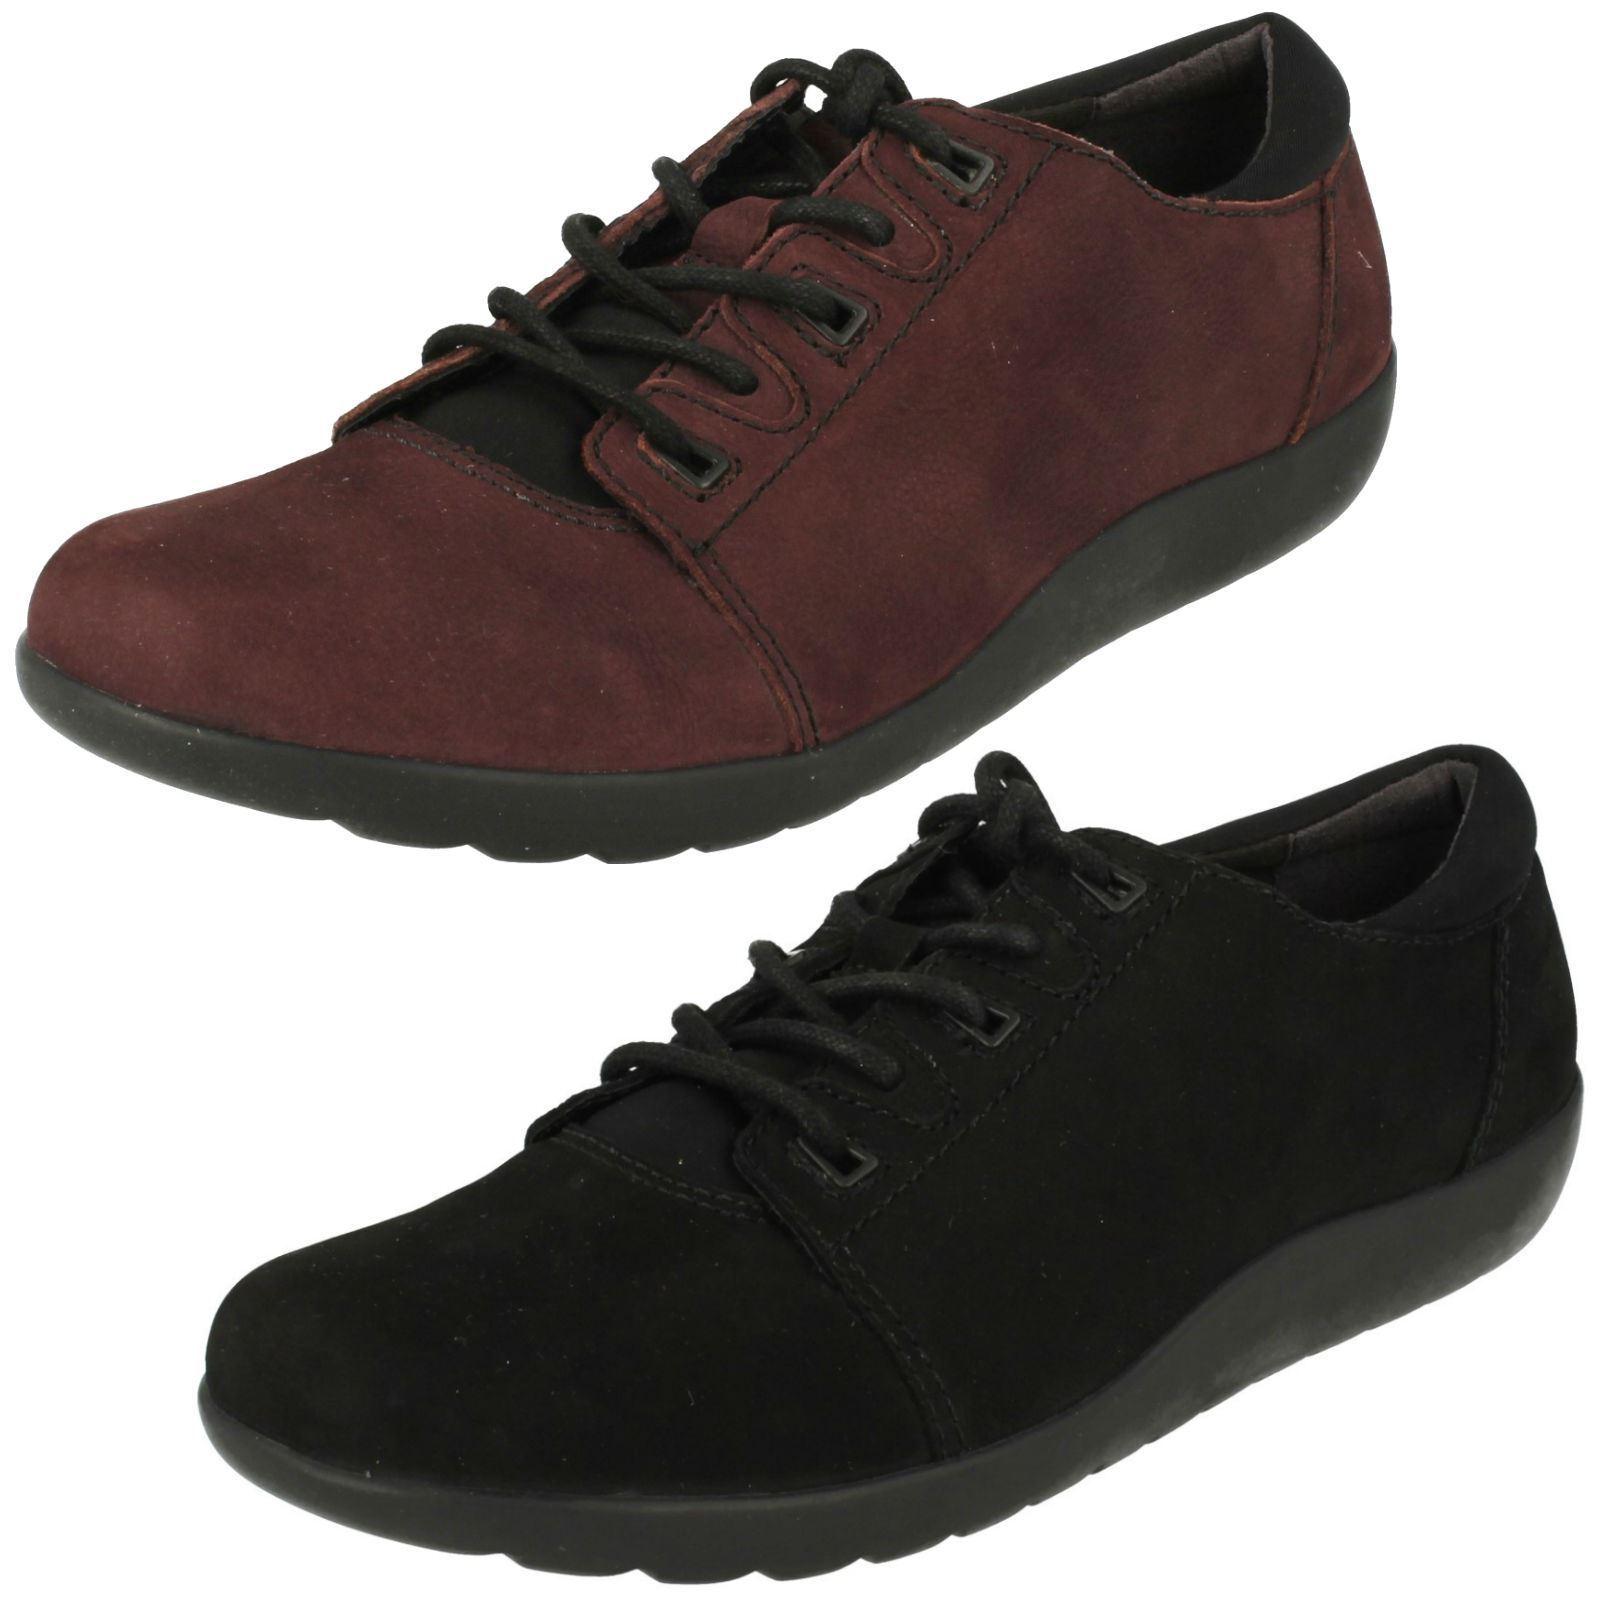 Ladies Clarks Lace Up Flat Shoes 'Medora Bella'